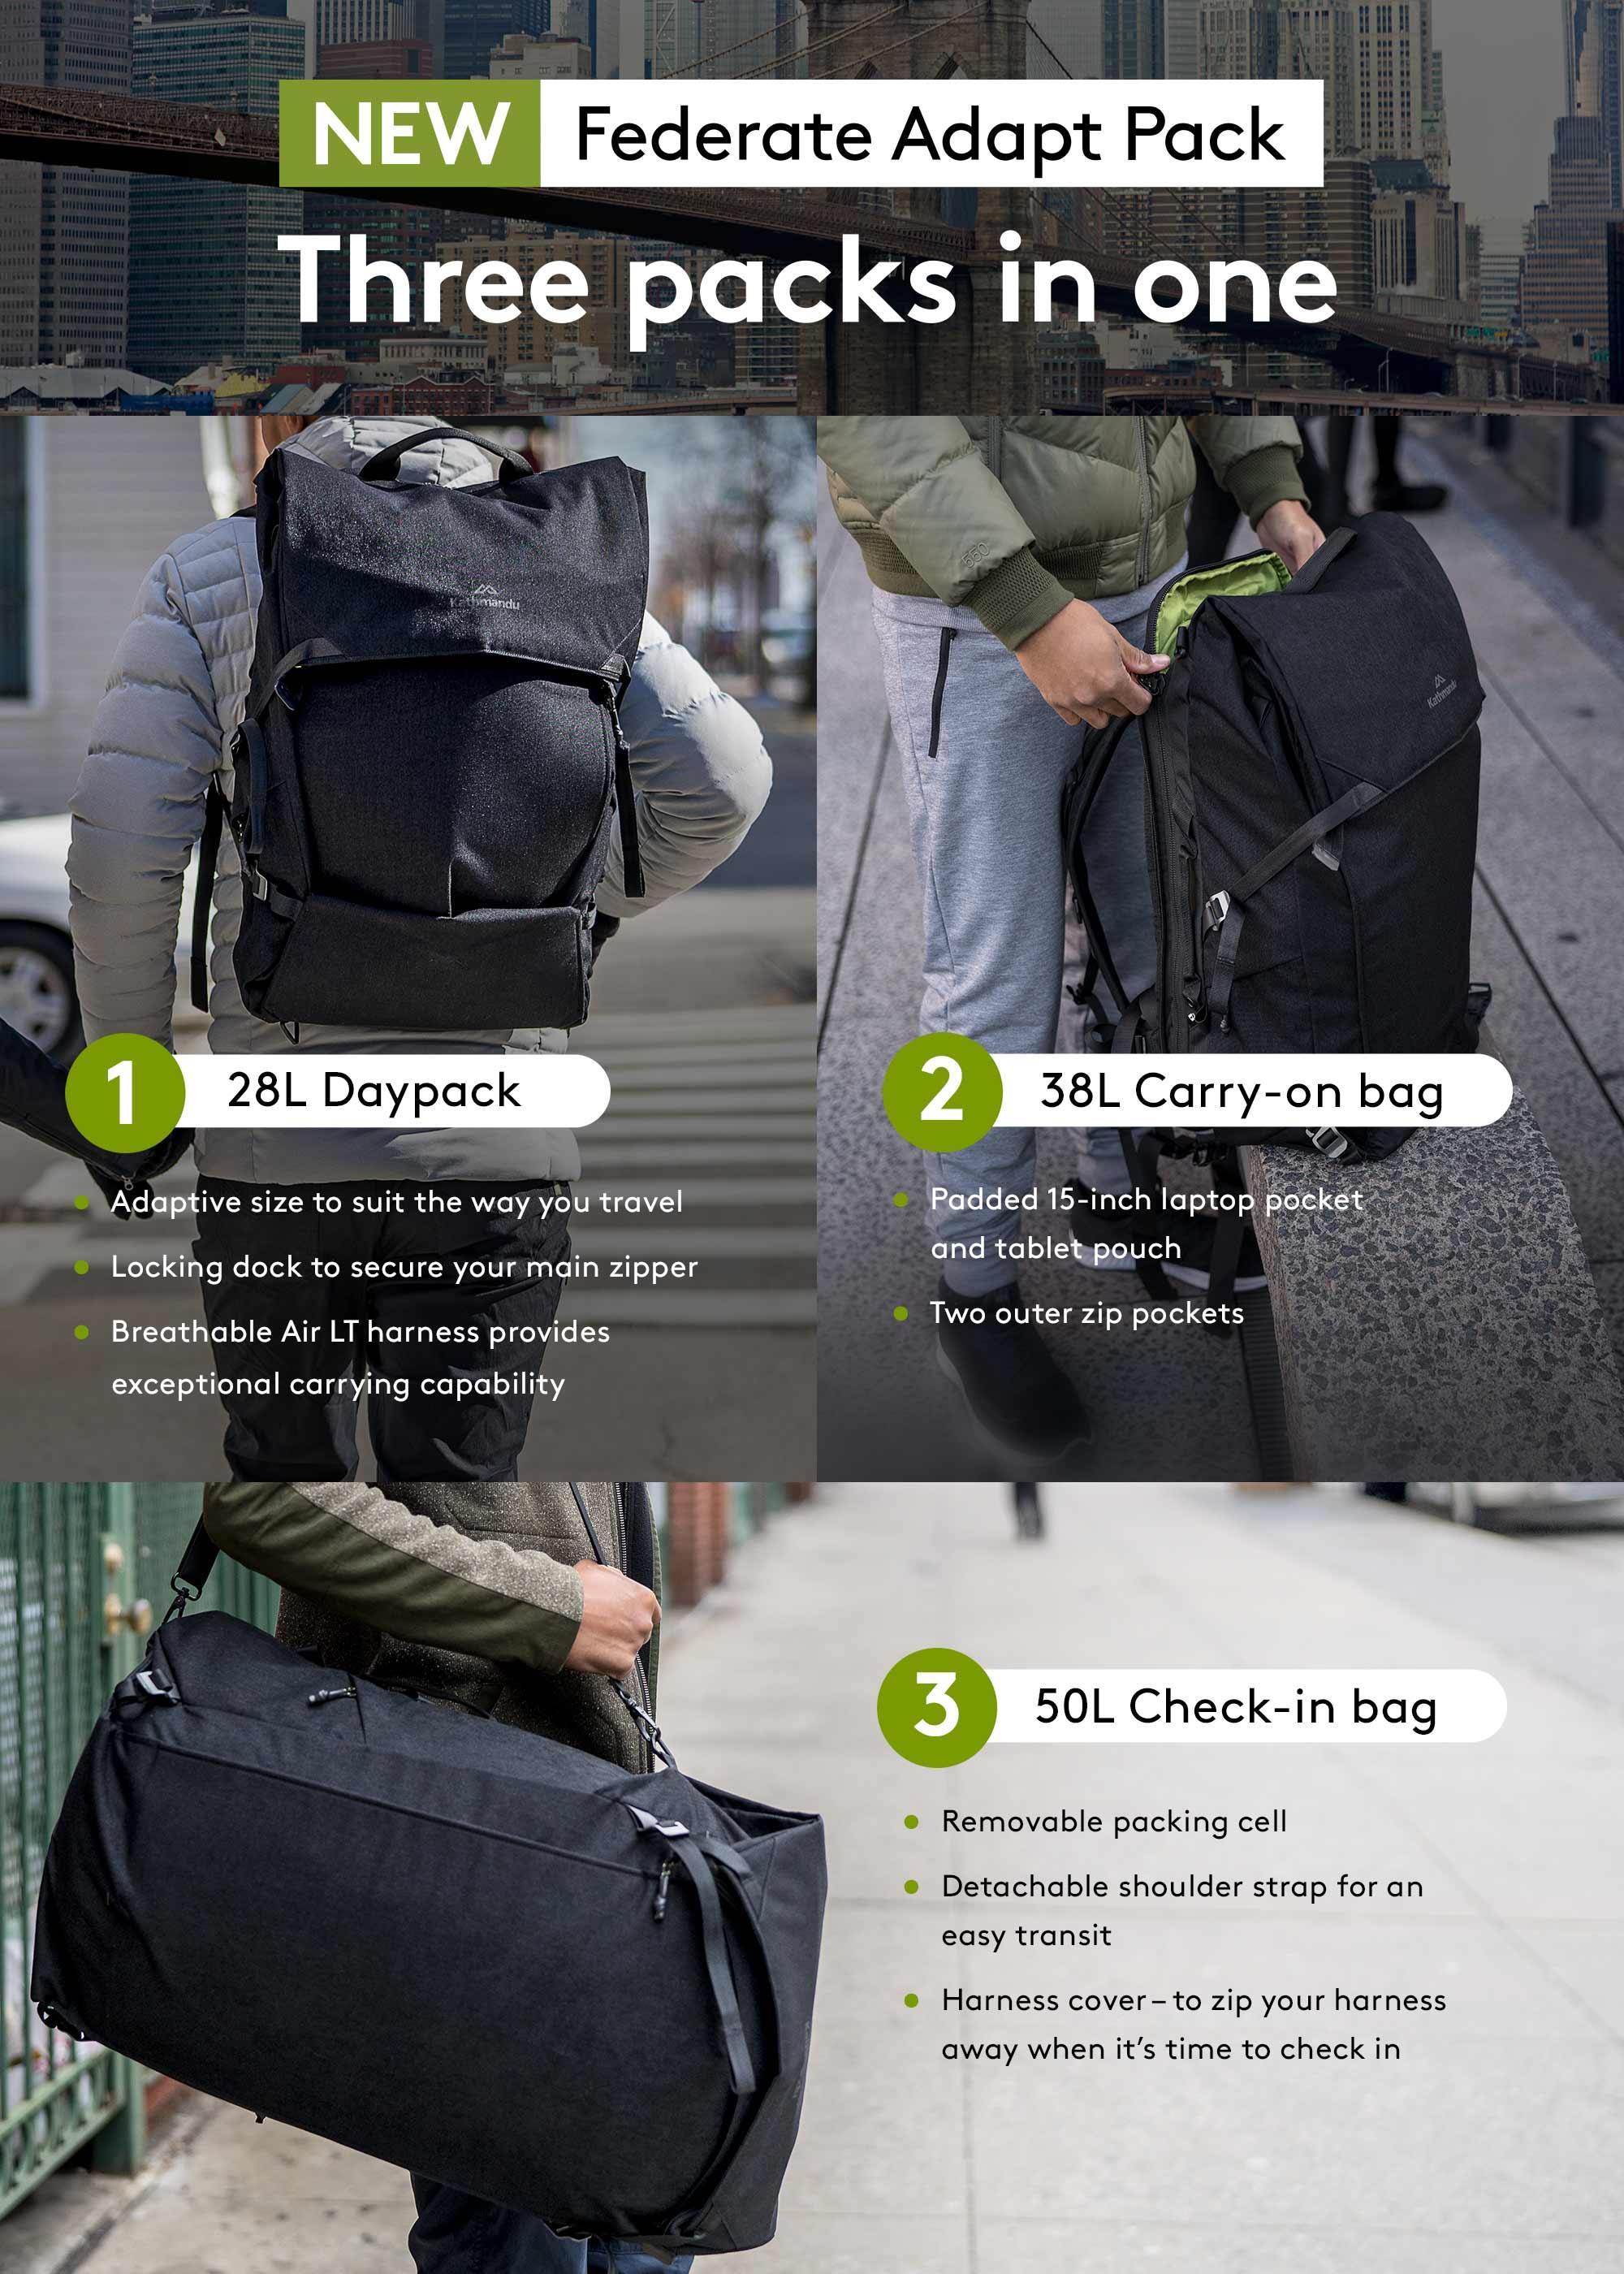 NEW Federate Adapt Pack - Three packs in one